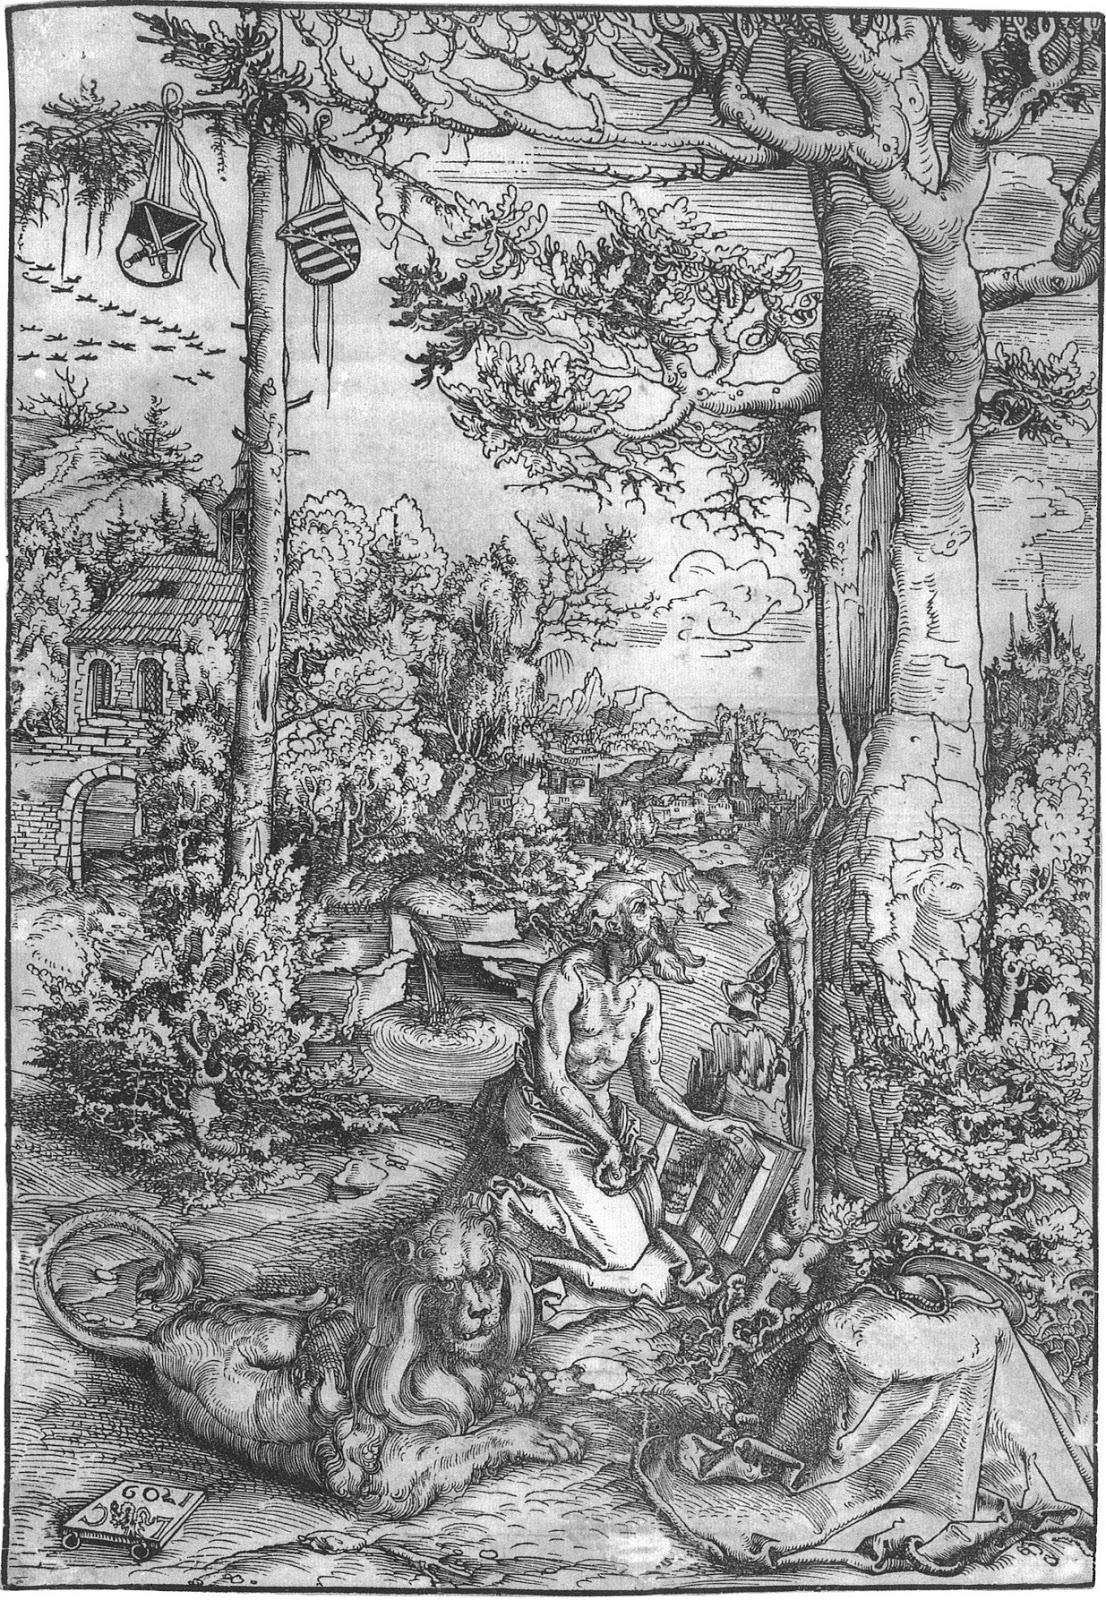 Liegende Quellnymphe - Lucas Cranach d. Ä. as art print or